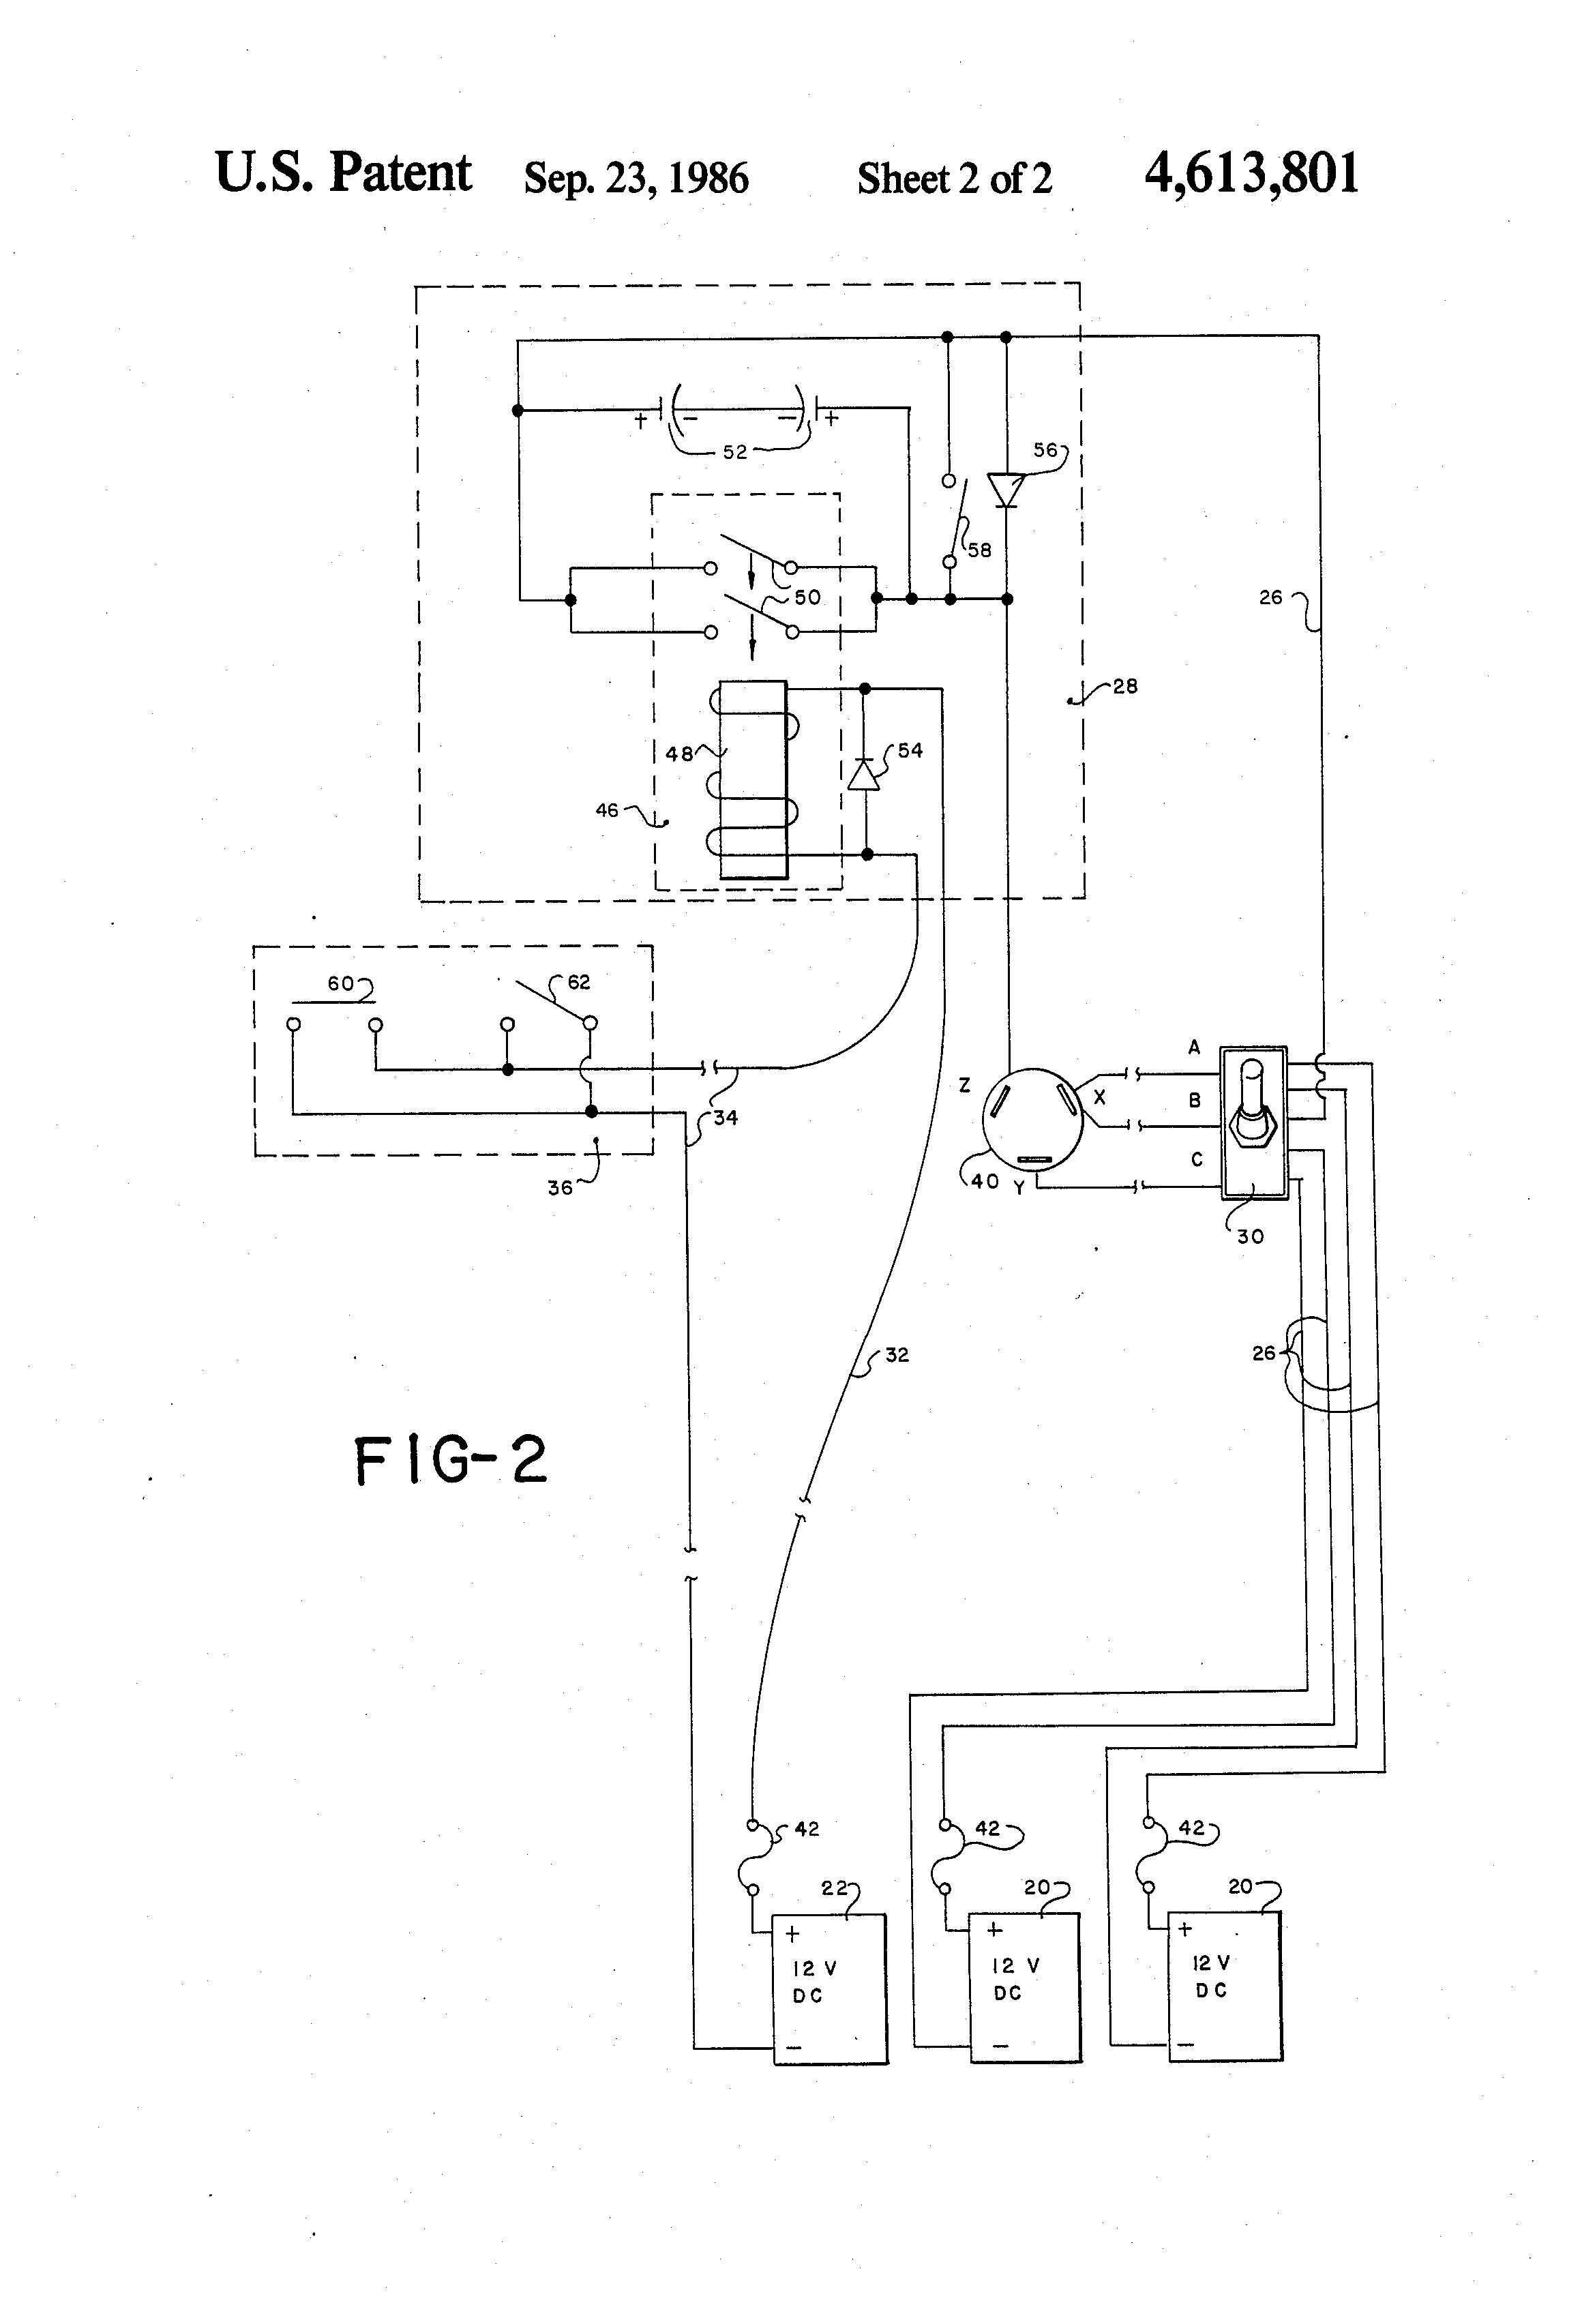 Diagram Wiring Diagram For 1986 Stratos 169v Full Version Hd Quality Stratos 169v Diagramdoddsq Streetdanceilfilm It